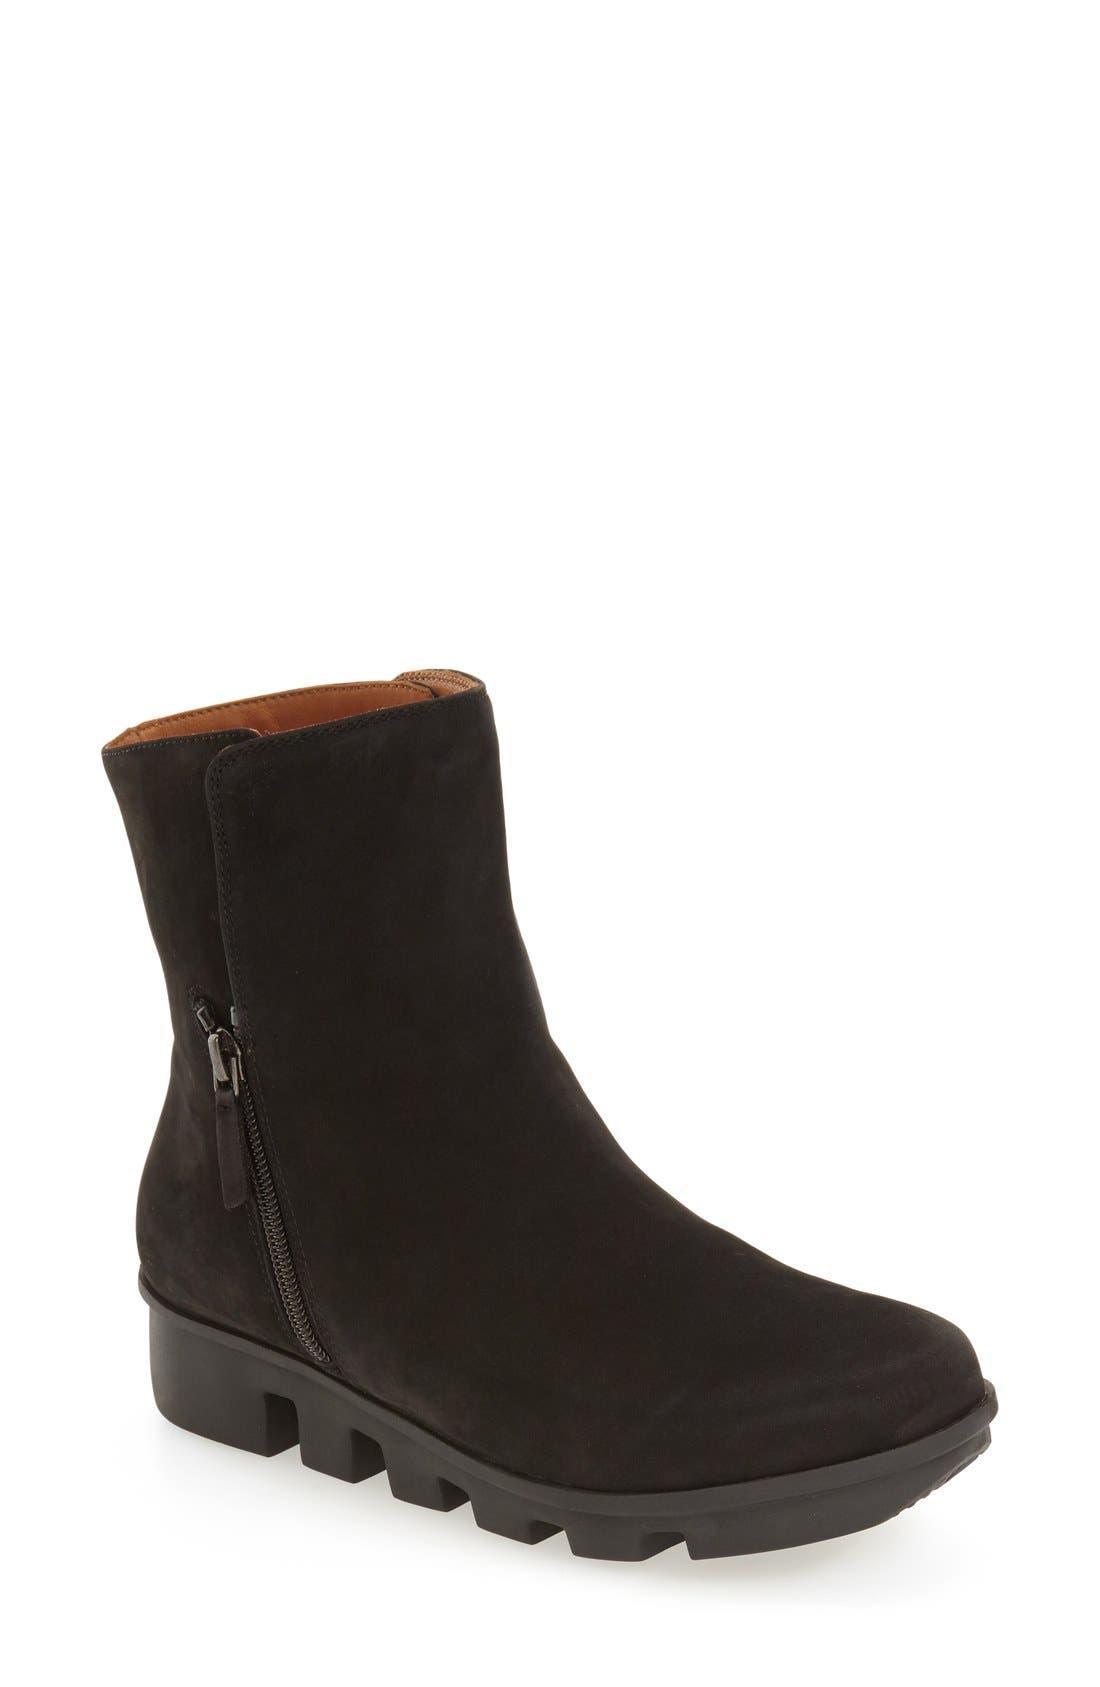 Main Image - L'Amour des Pieds 'Harrietta' Boot (Women)